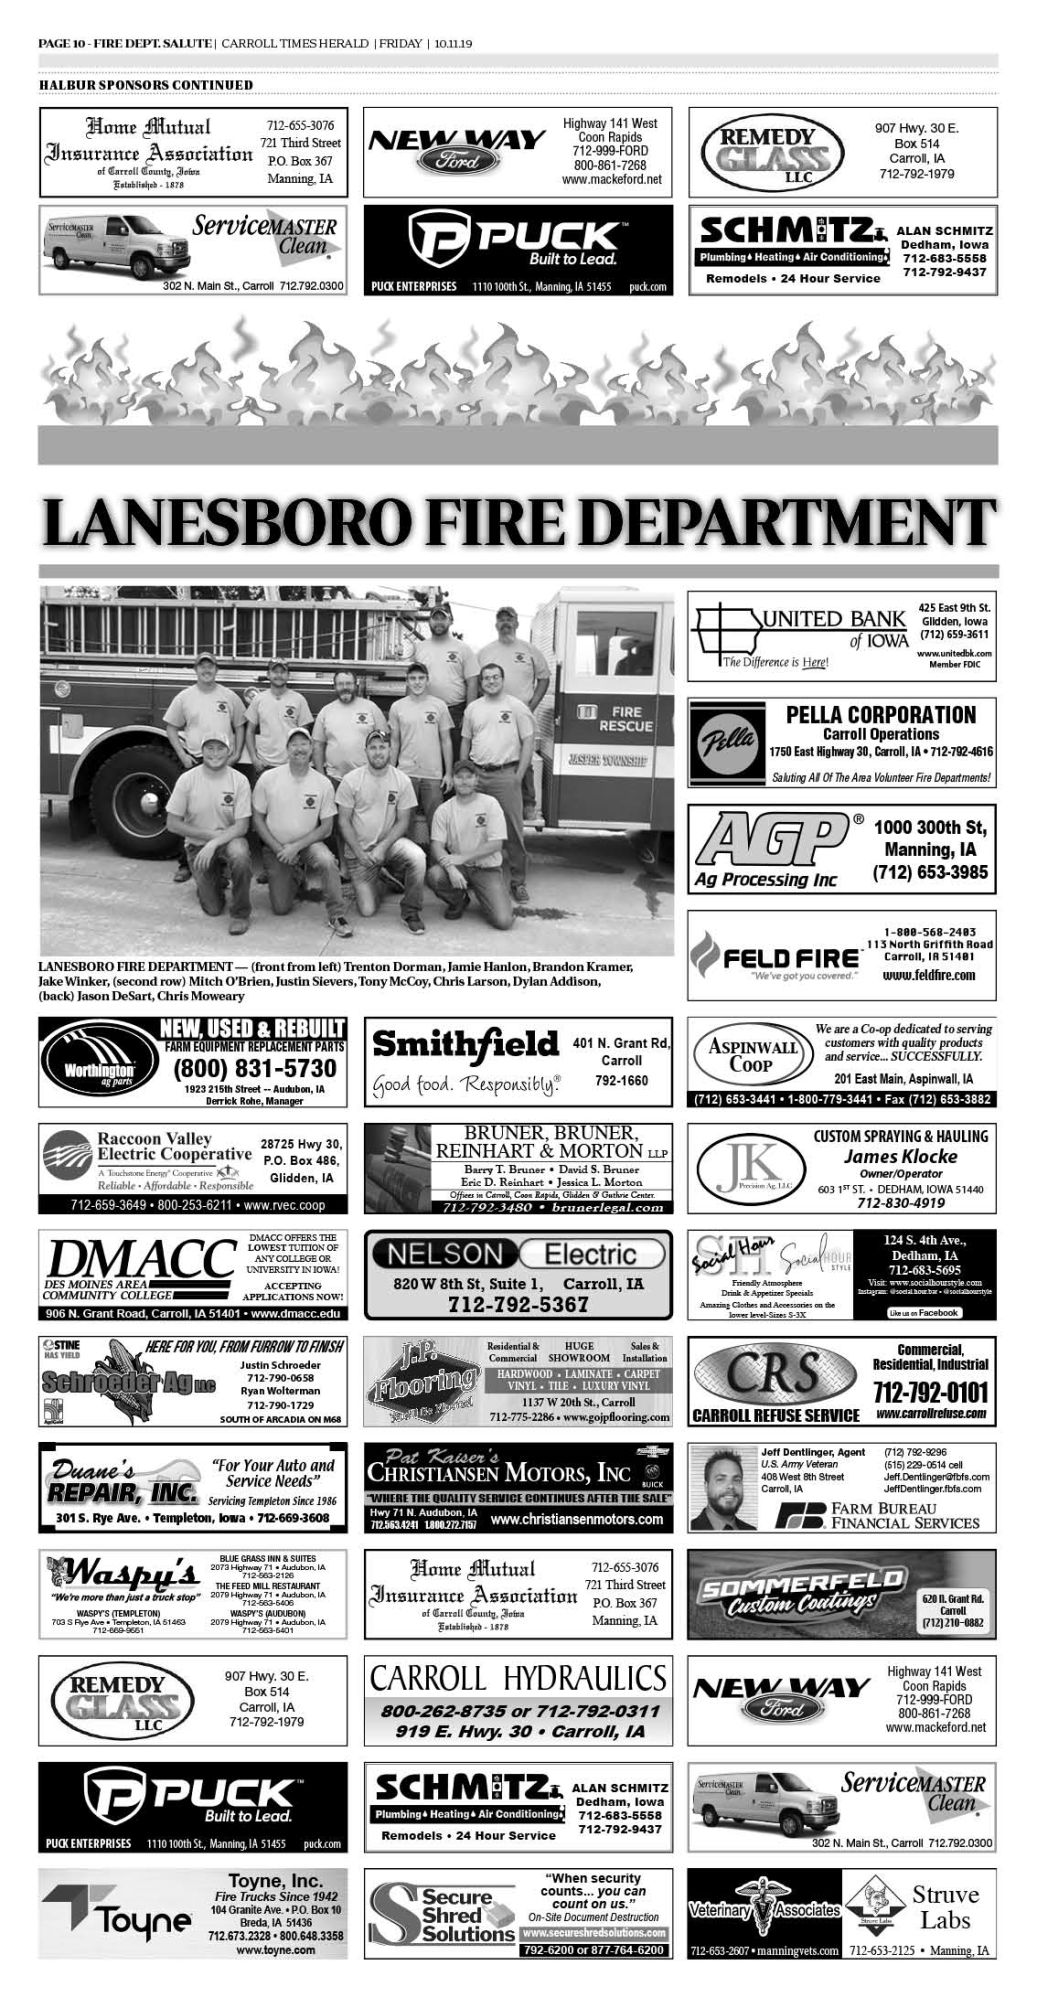 10-11 FIRE-Page 10.jpg